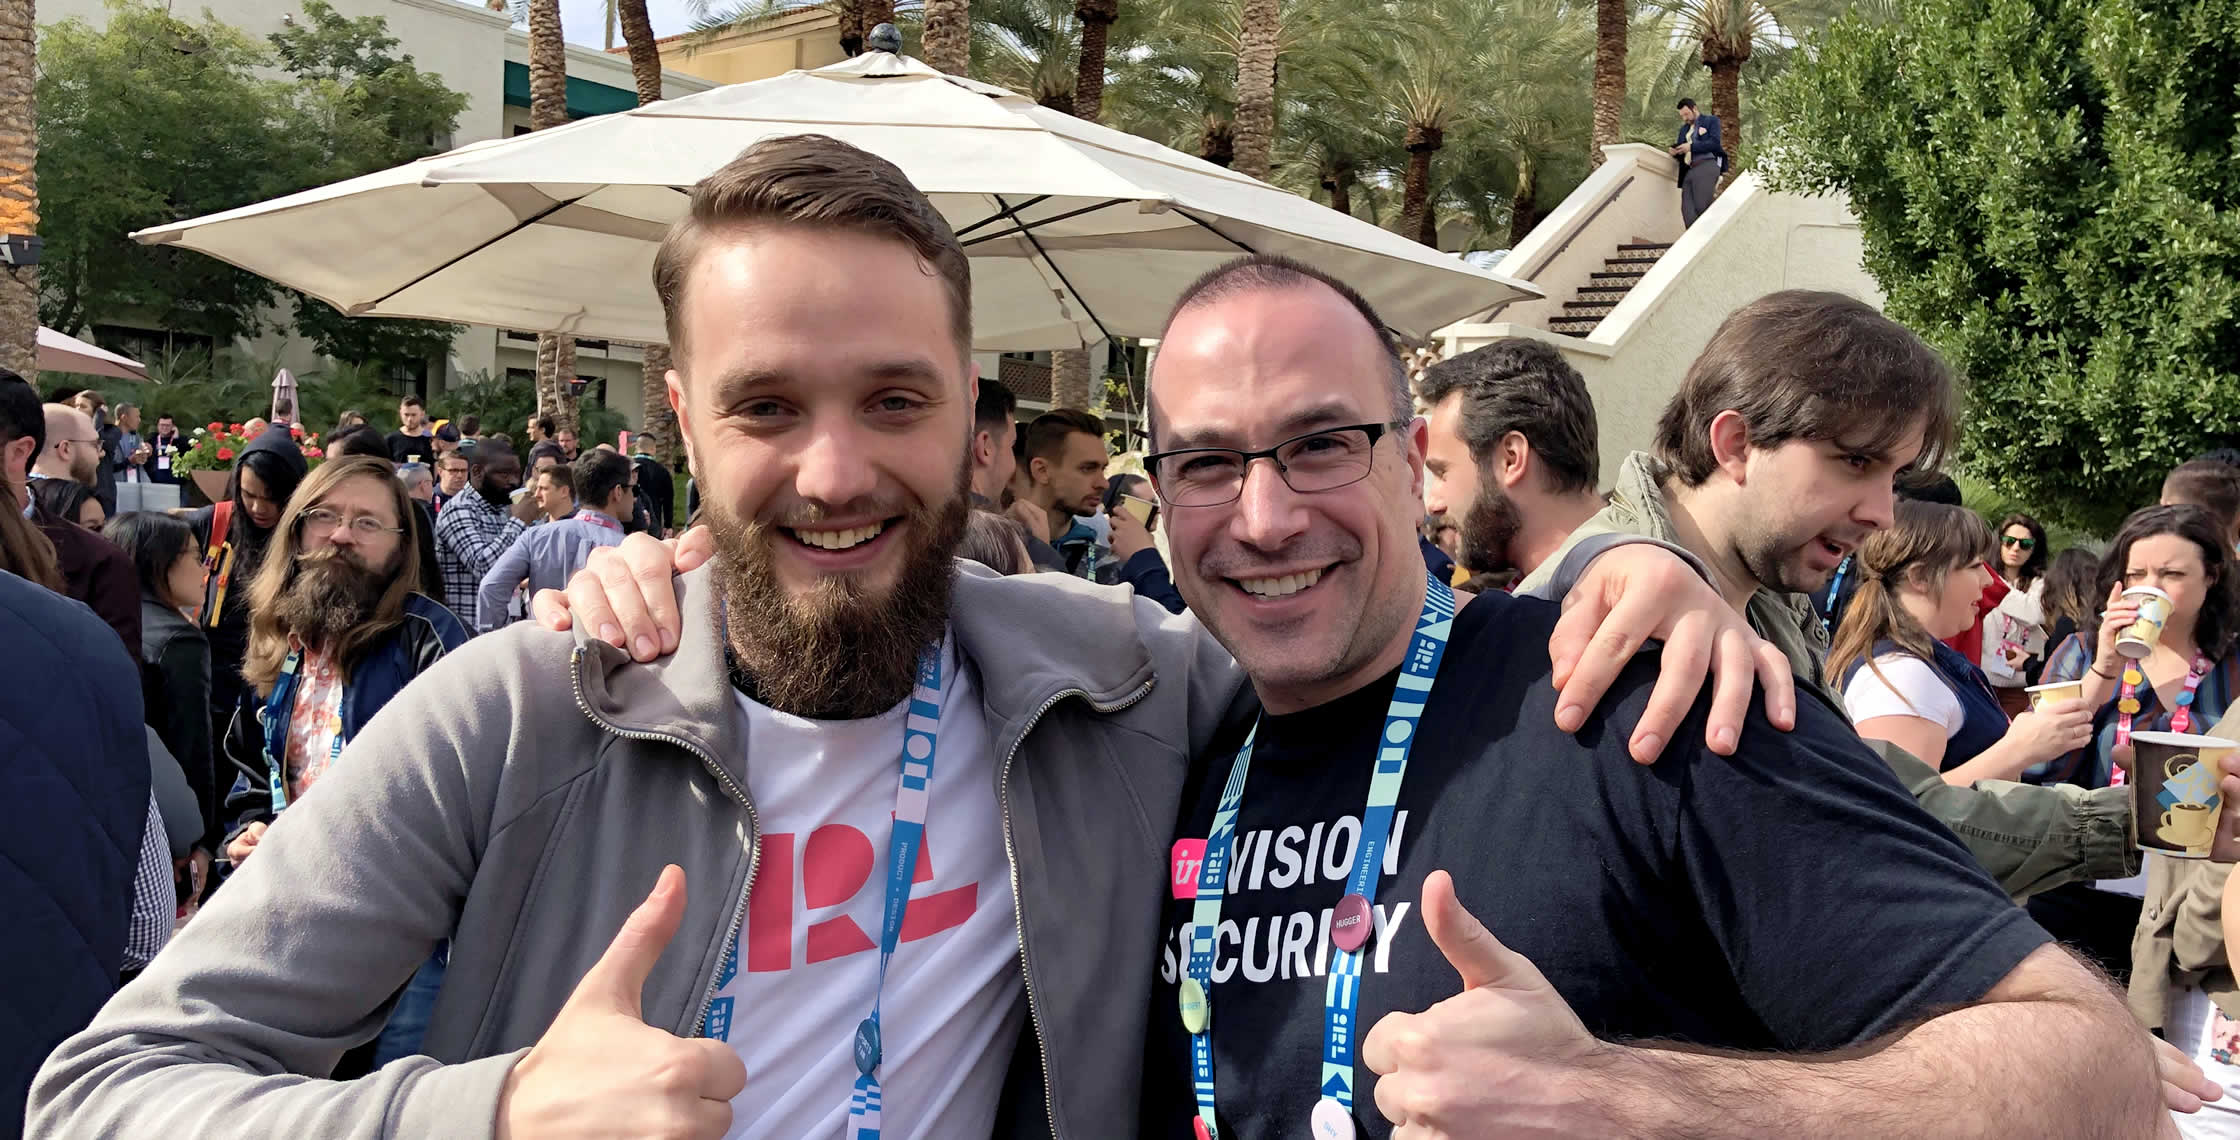 Ben Nadel at InVision In Real Life (IRL) 2019 (Phoenix, AZ) with: Jonas Bučinskas